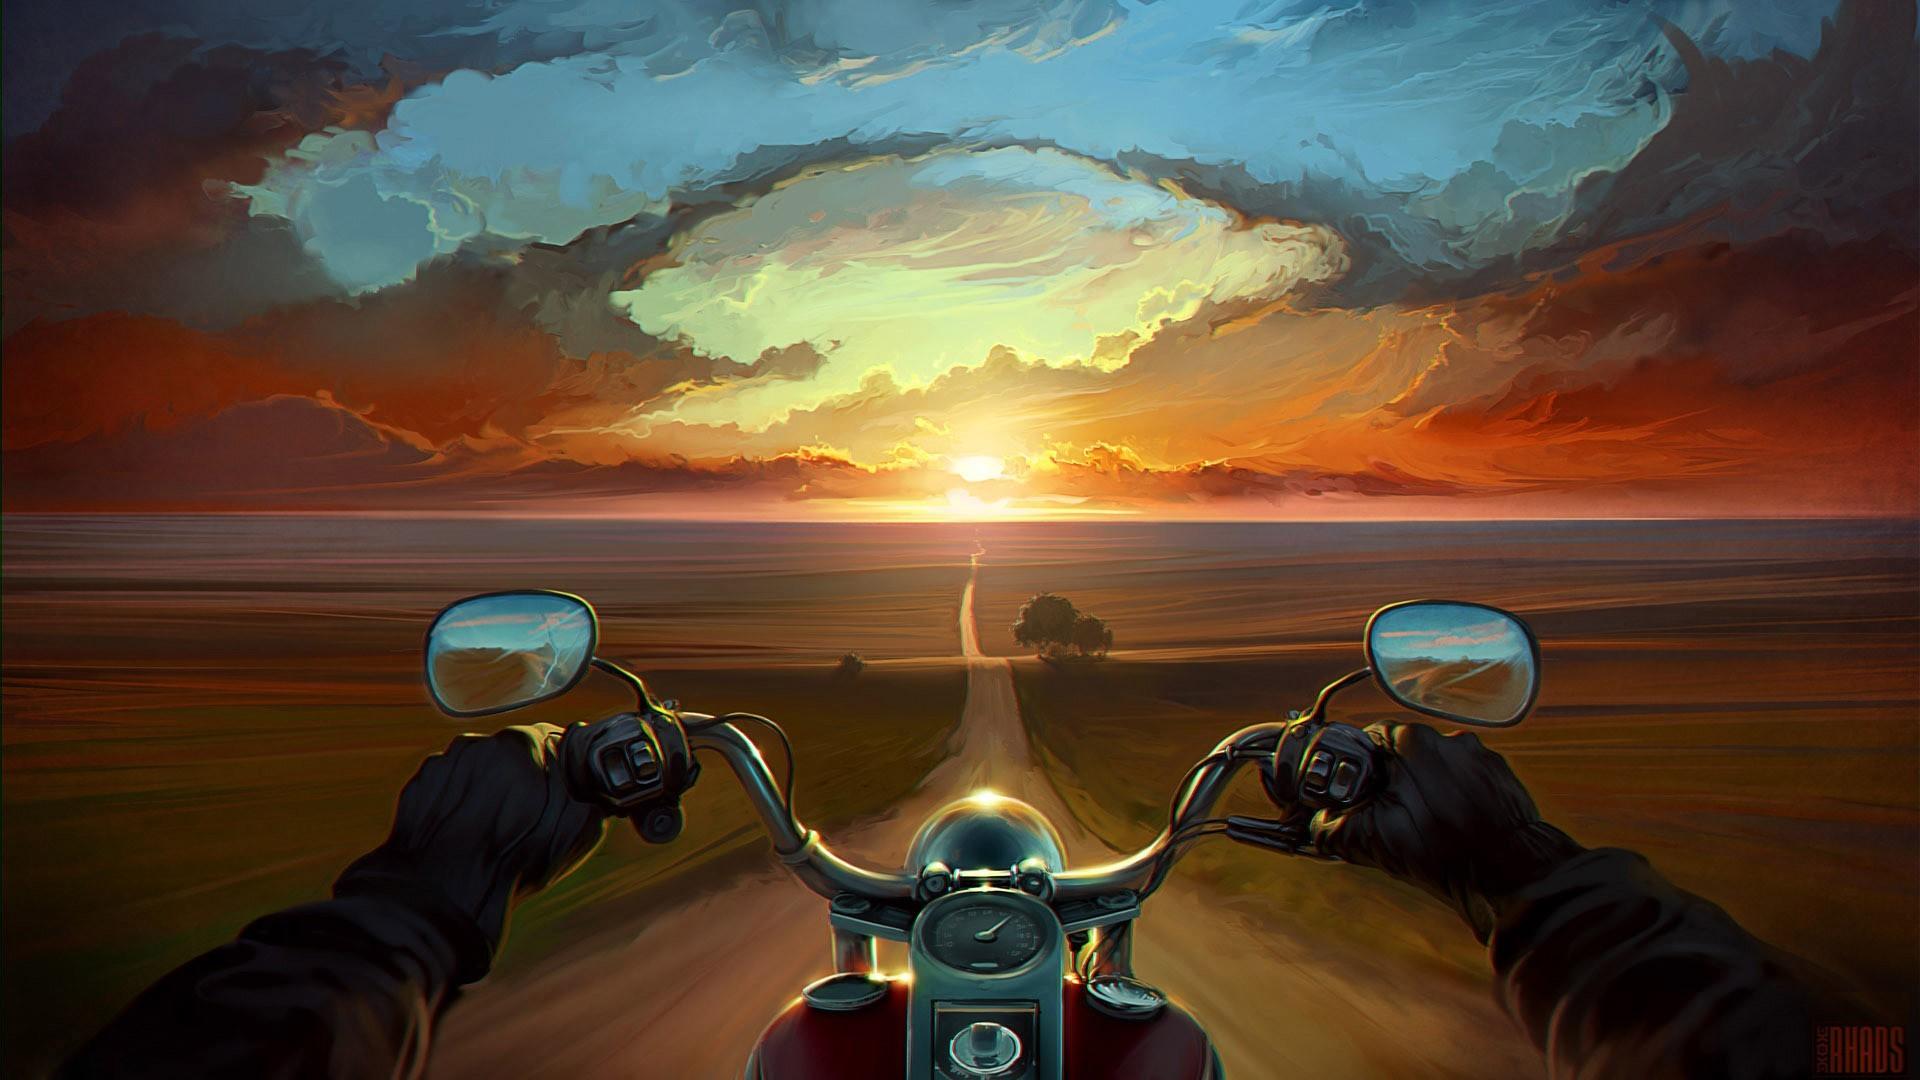 Riding Hd